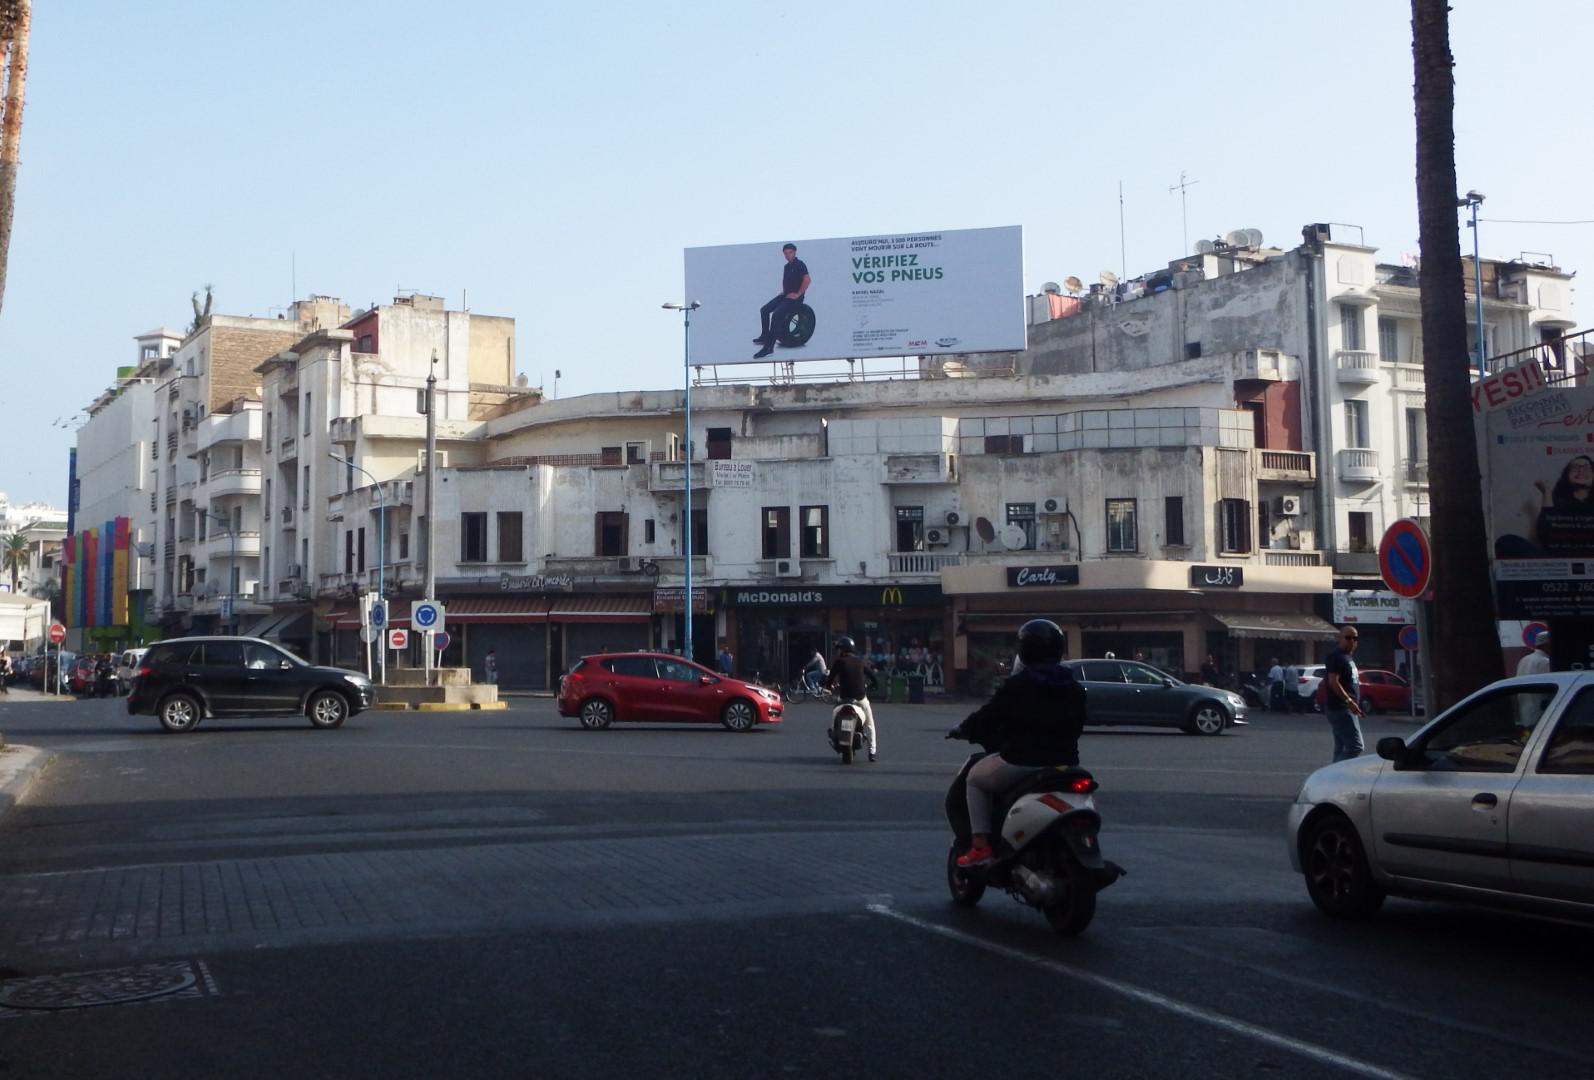 mobilite-club-maroc-deploie-la-campagne-mondiale-3500lives-a-casablanca-835-3.jpg